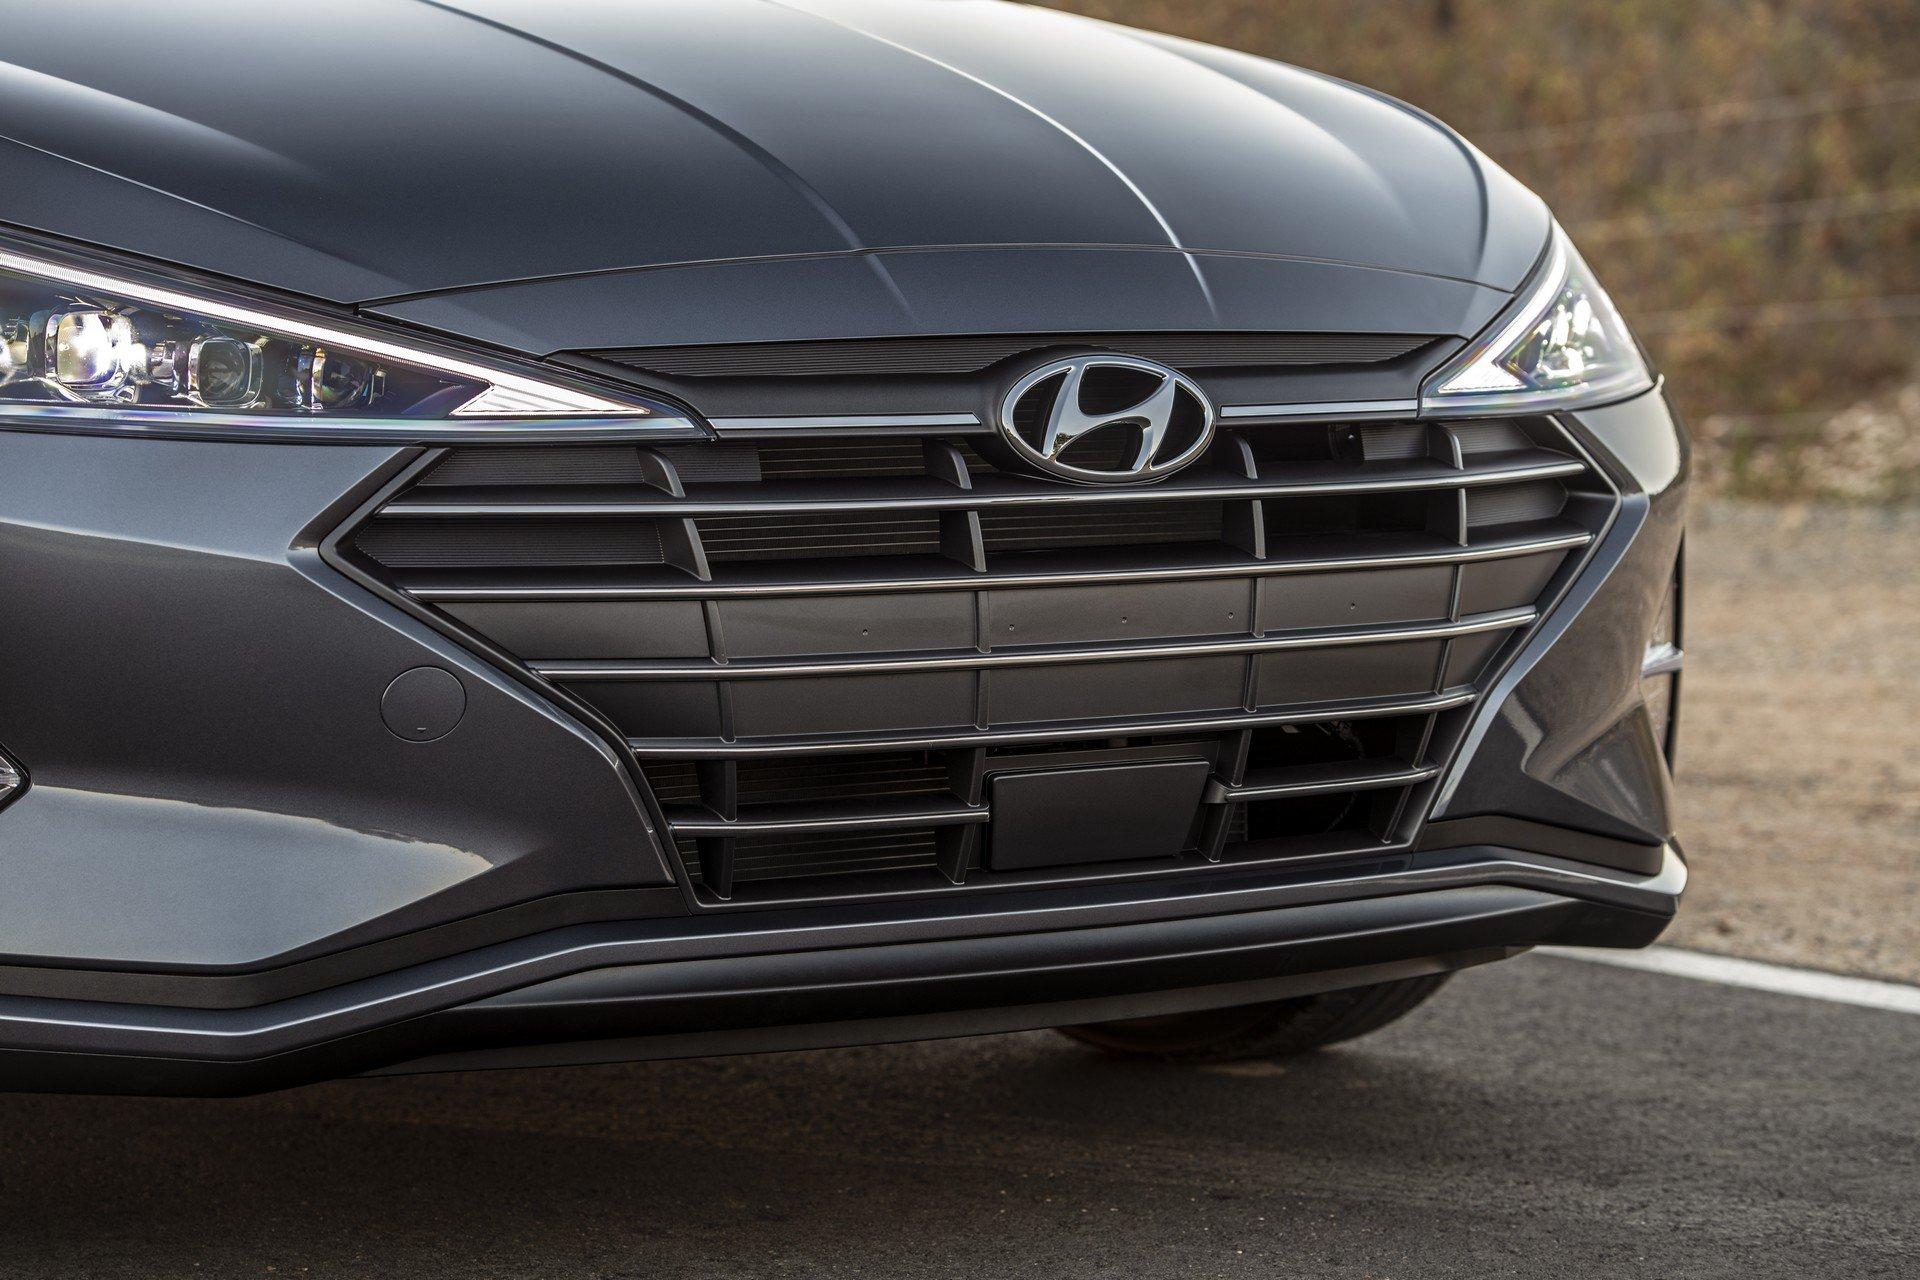 Hyundai Elantra 2019 (10)